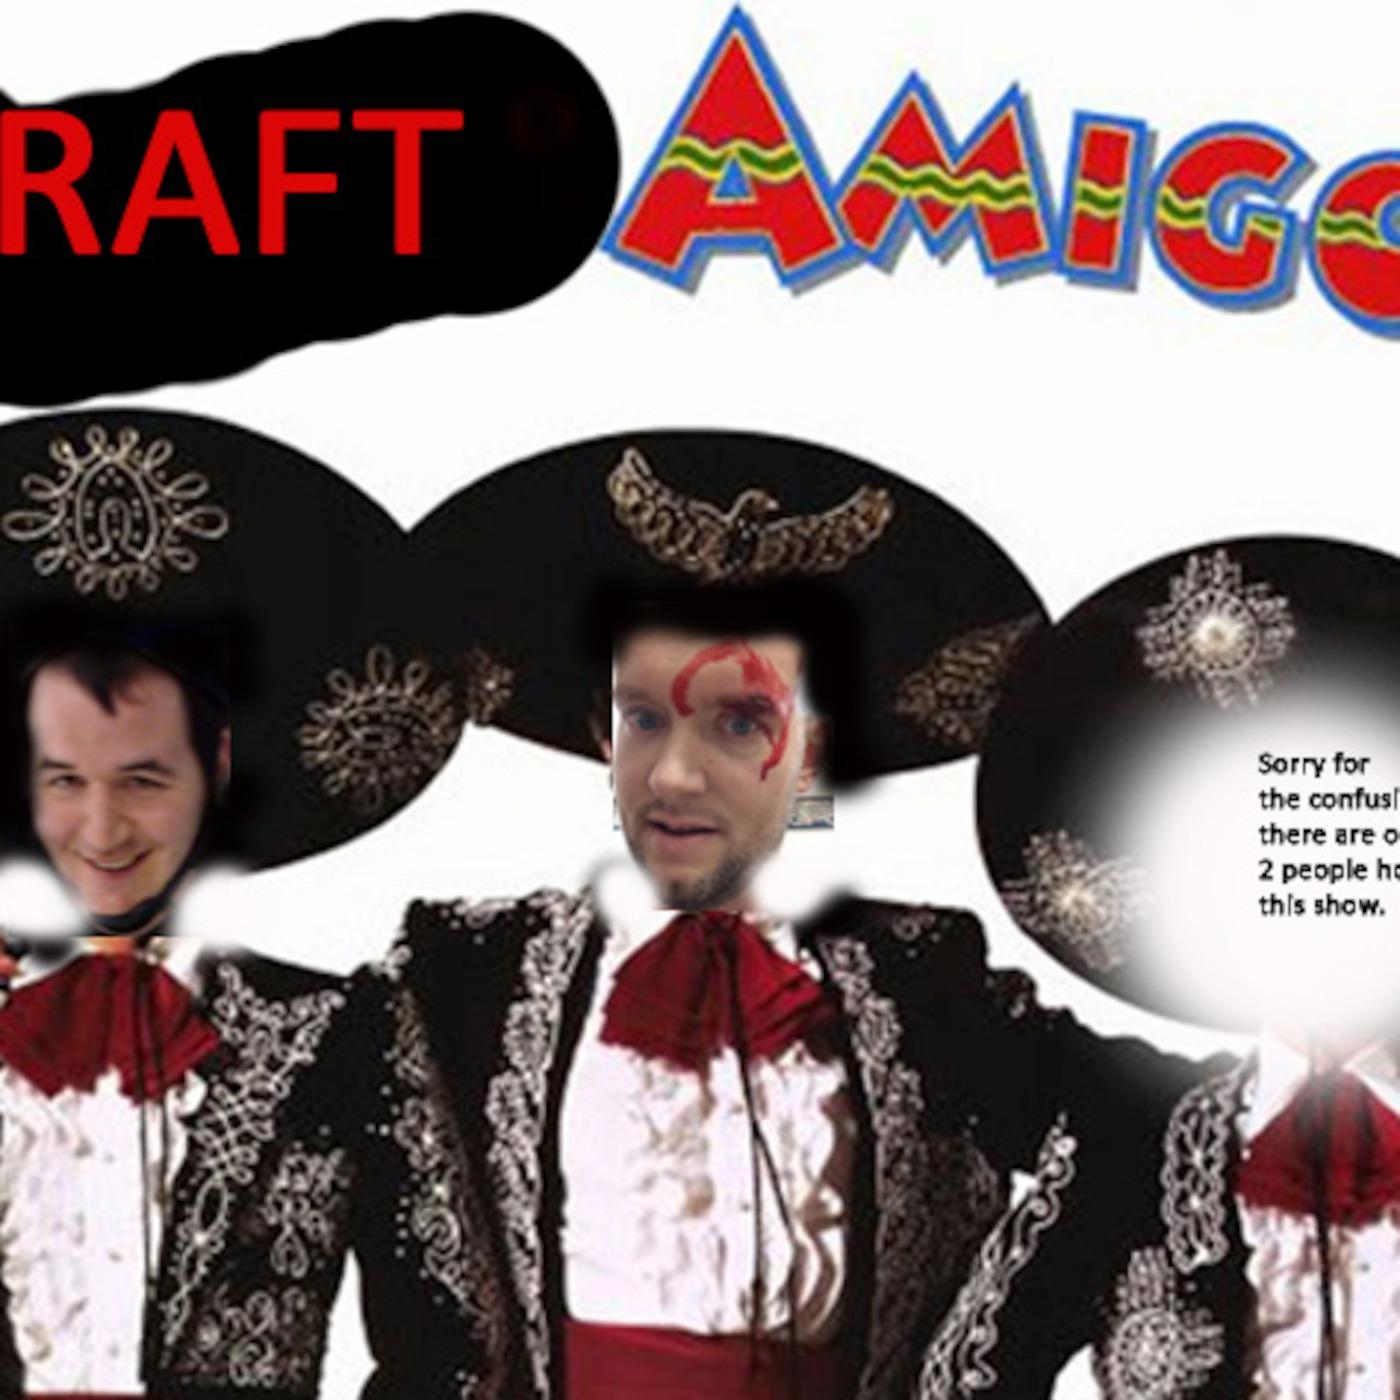 Draft Amigos